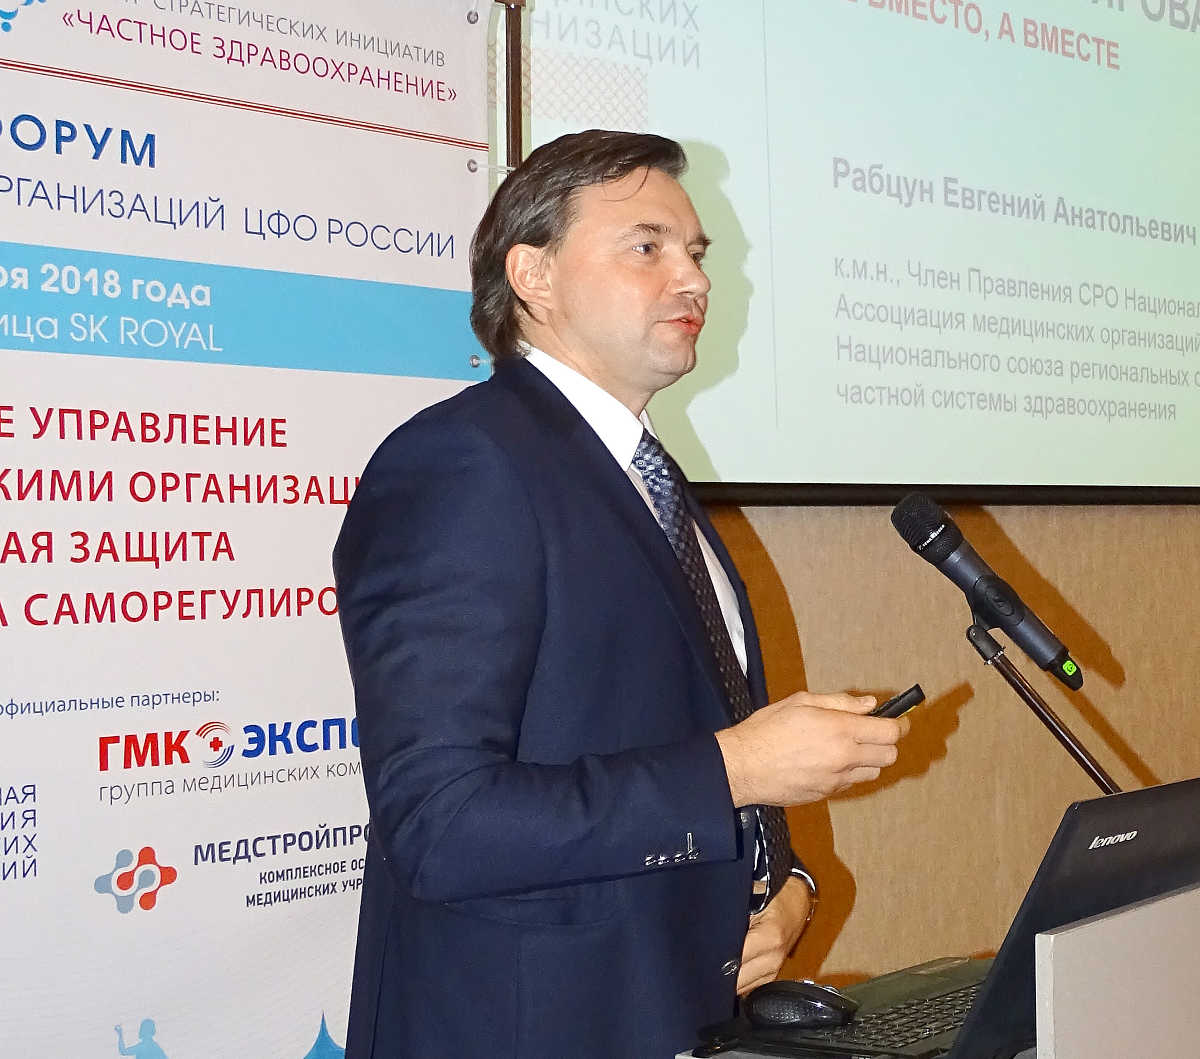 Фото III-го Форума частных медицинских организаций ЦФО N 26